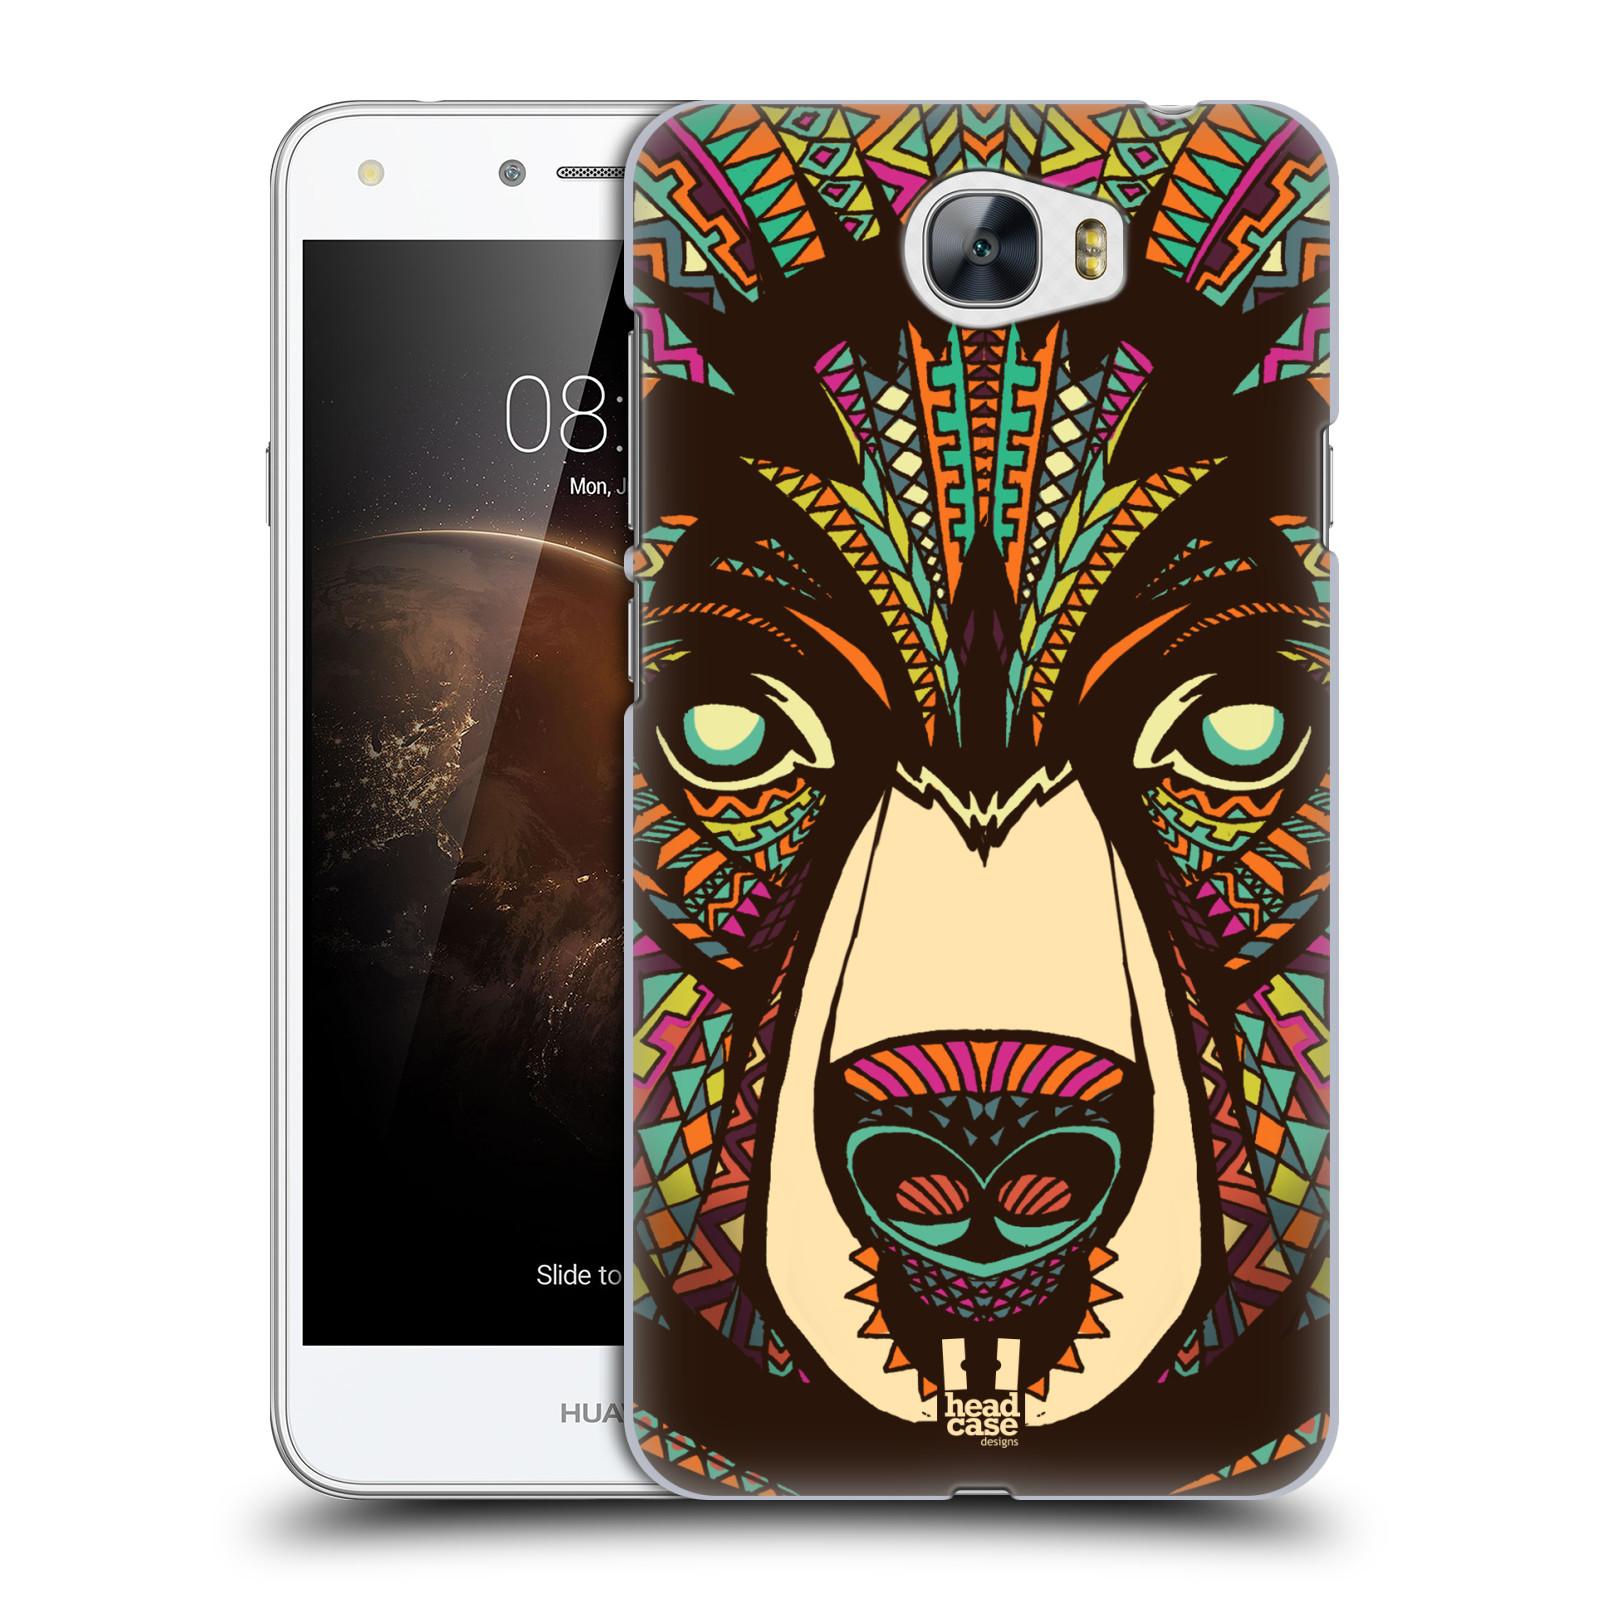 Plastové pouzdro na mobil Huawei Y5 II HEAD CASE AZTEC MEDVĚD